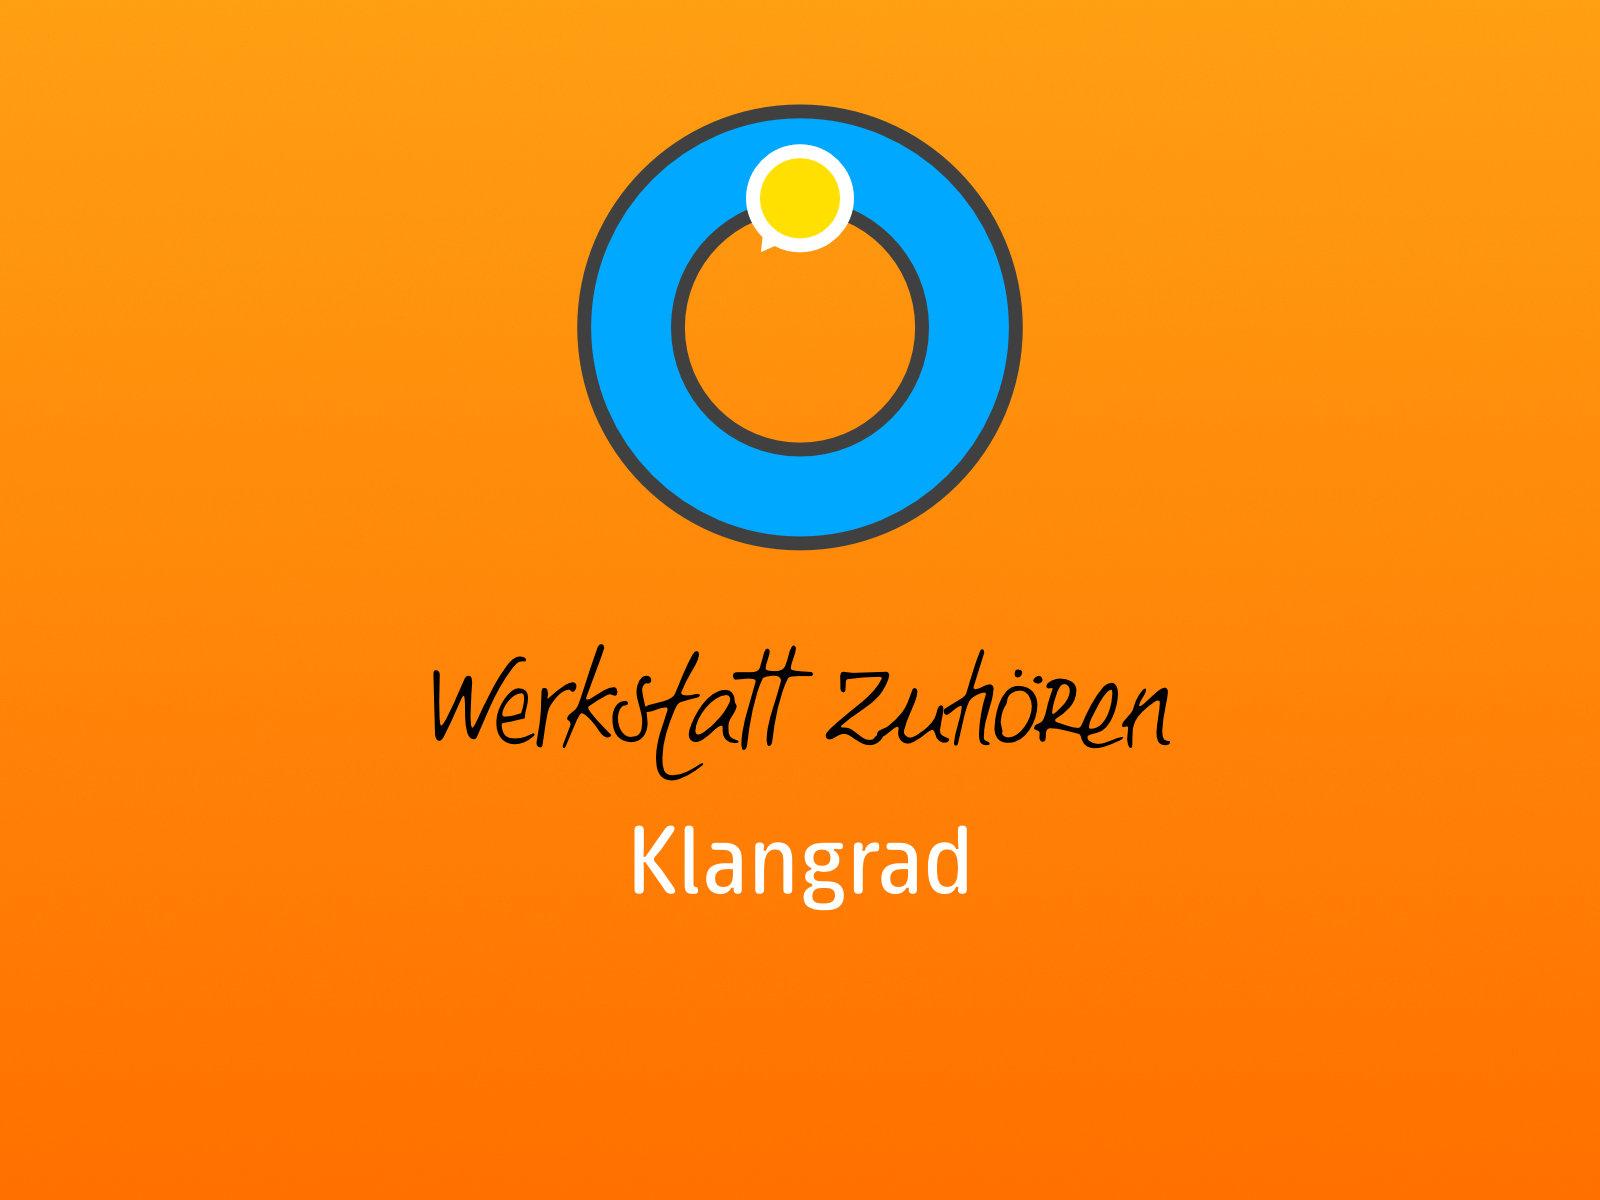 Klangrad Background 1